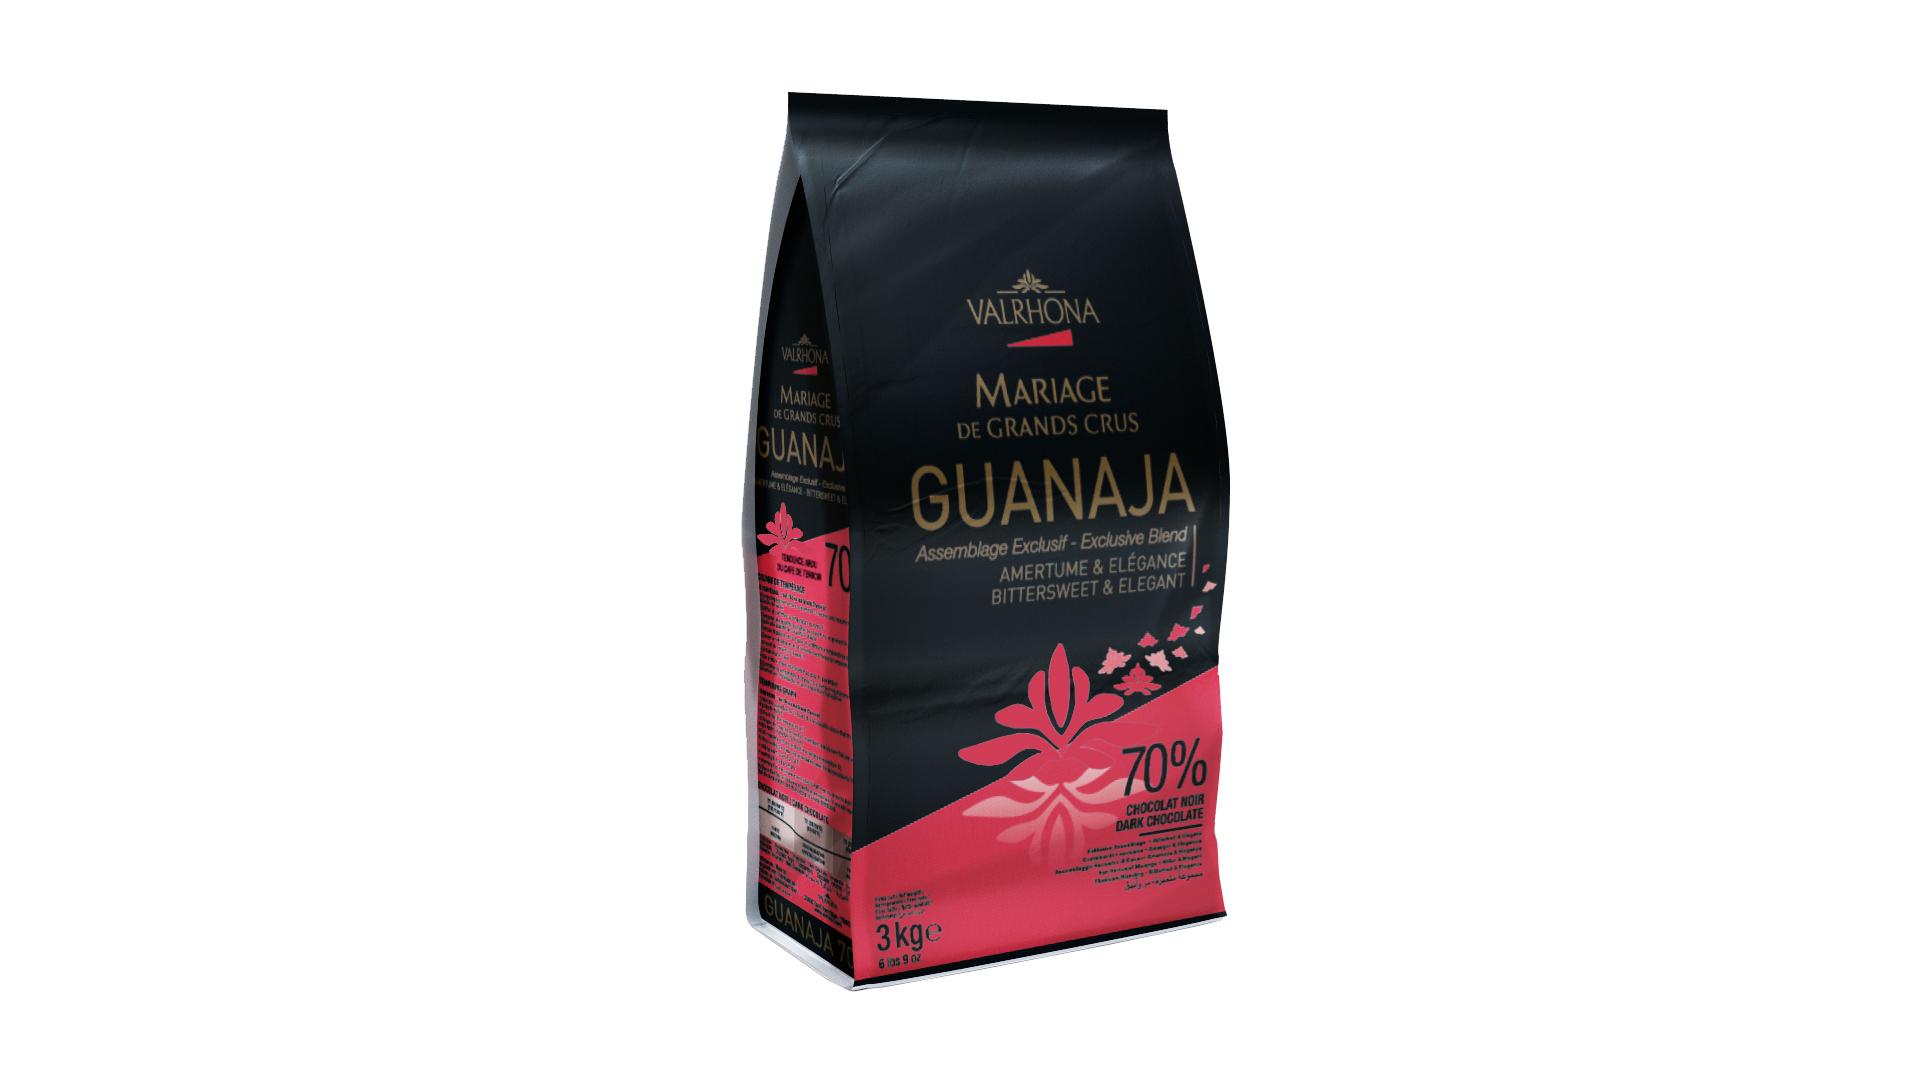 Valrhona Guanaja 70% Dark Chocolate Couverture Feves  #4653